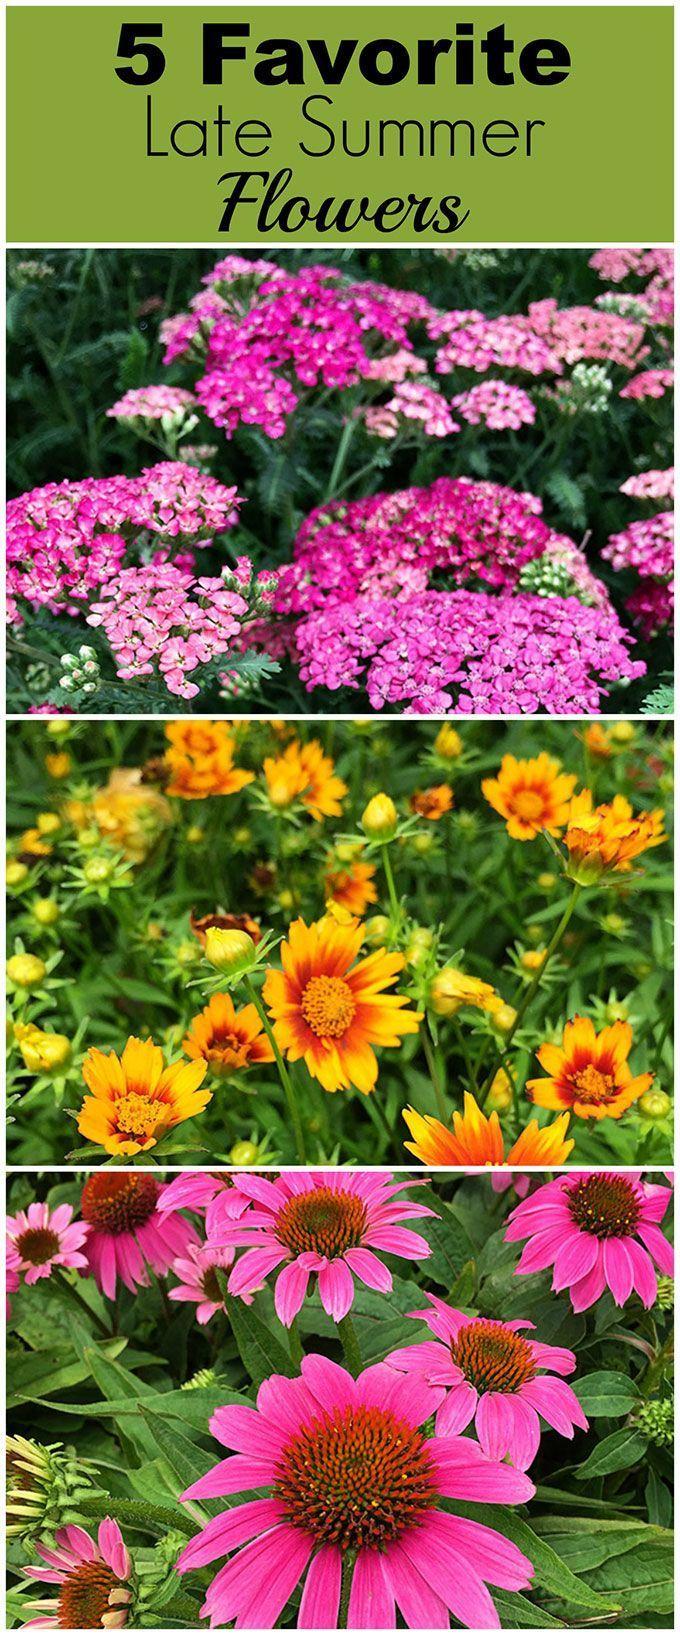 683 best gardening ideas images on pinterest gardening tips